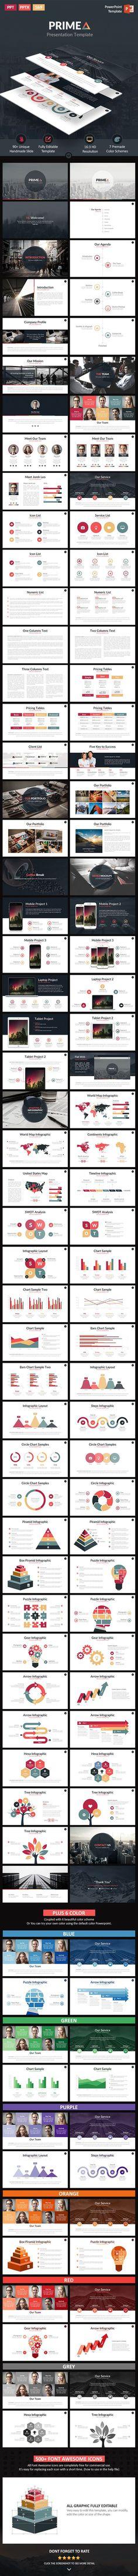 Primea - PowerPoint Presentation Template #design Download: http://graphicriver.net/item/primea-powerpoint-presentation-template/11828976?ref=ksioks: